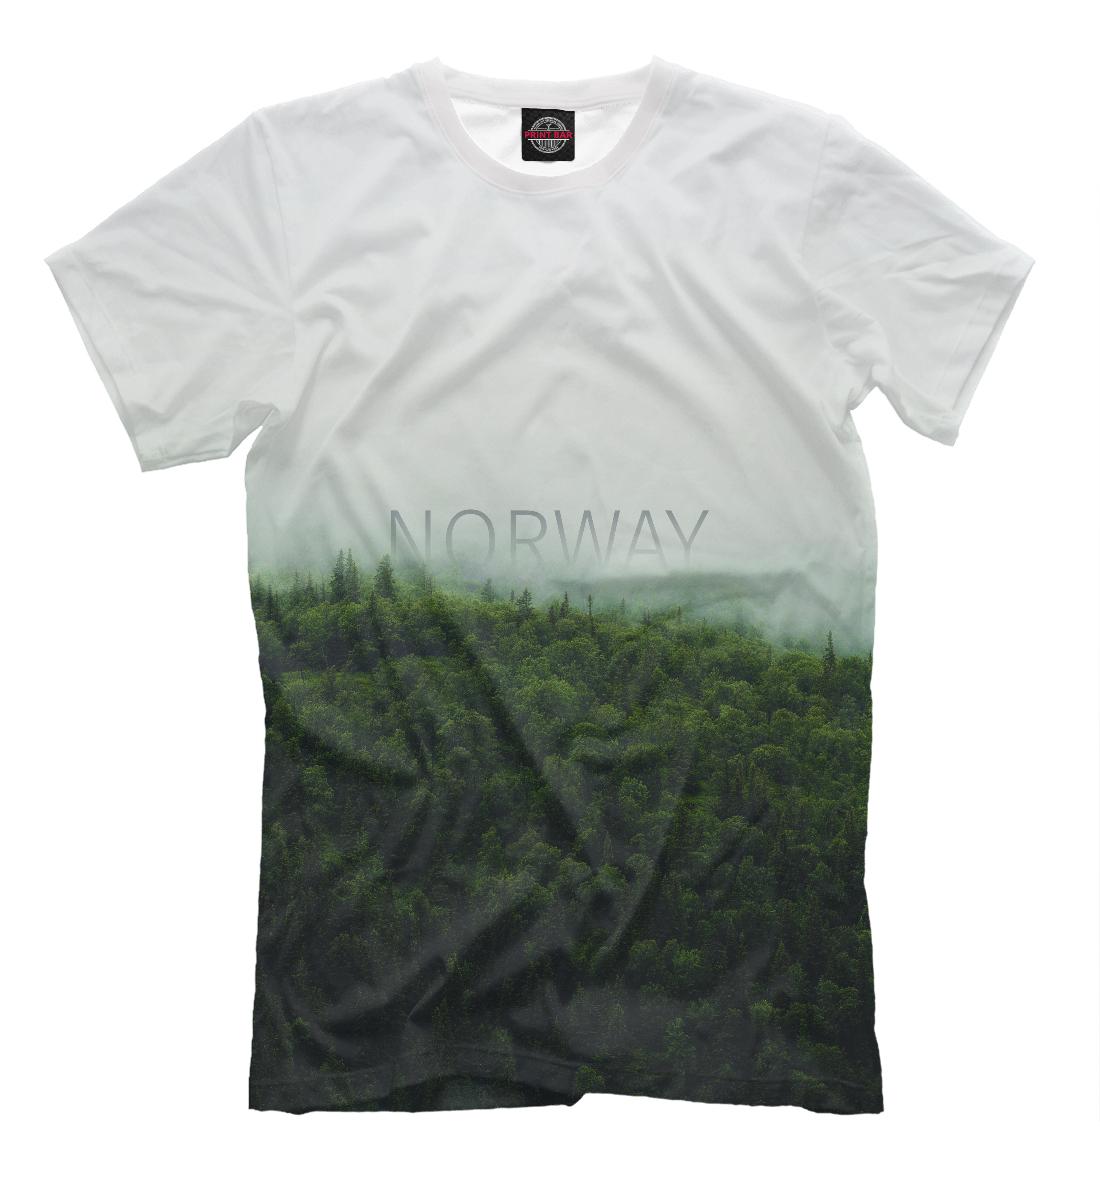 Купить Норвегия, Printbar, Футболки, TRL-376358-fut-2